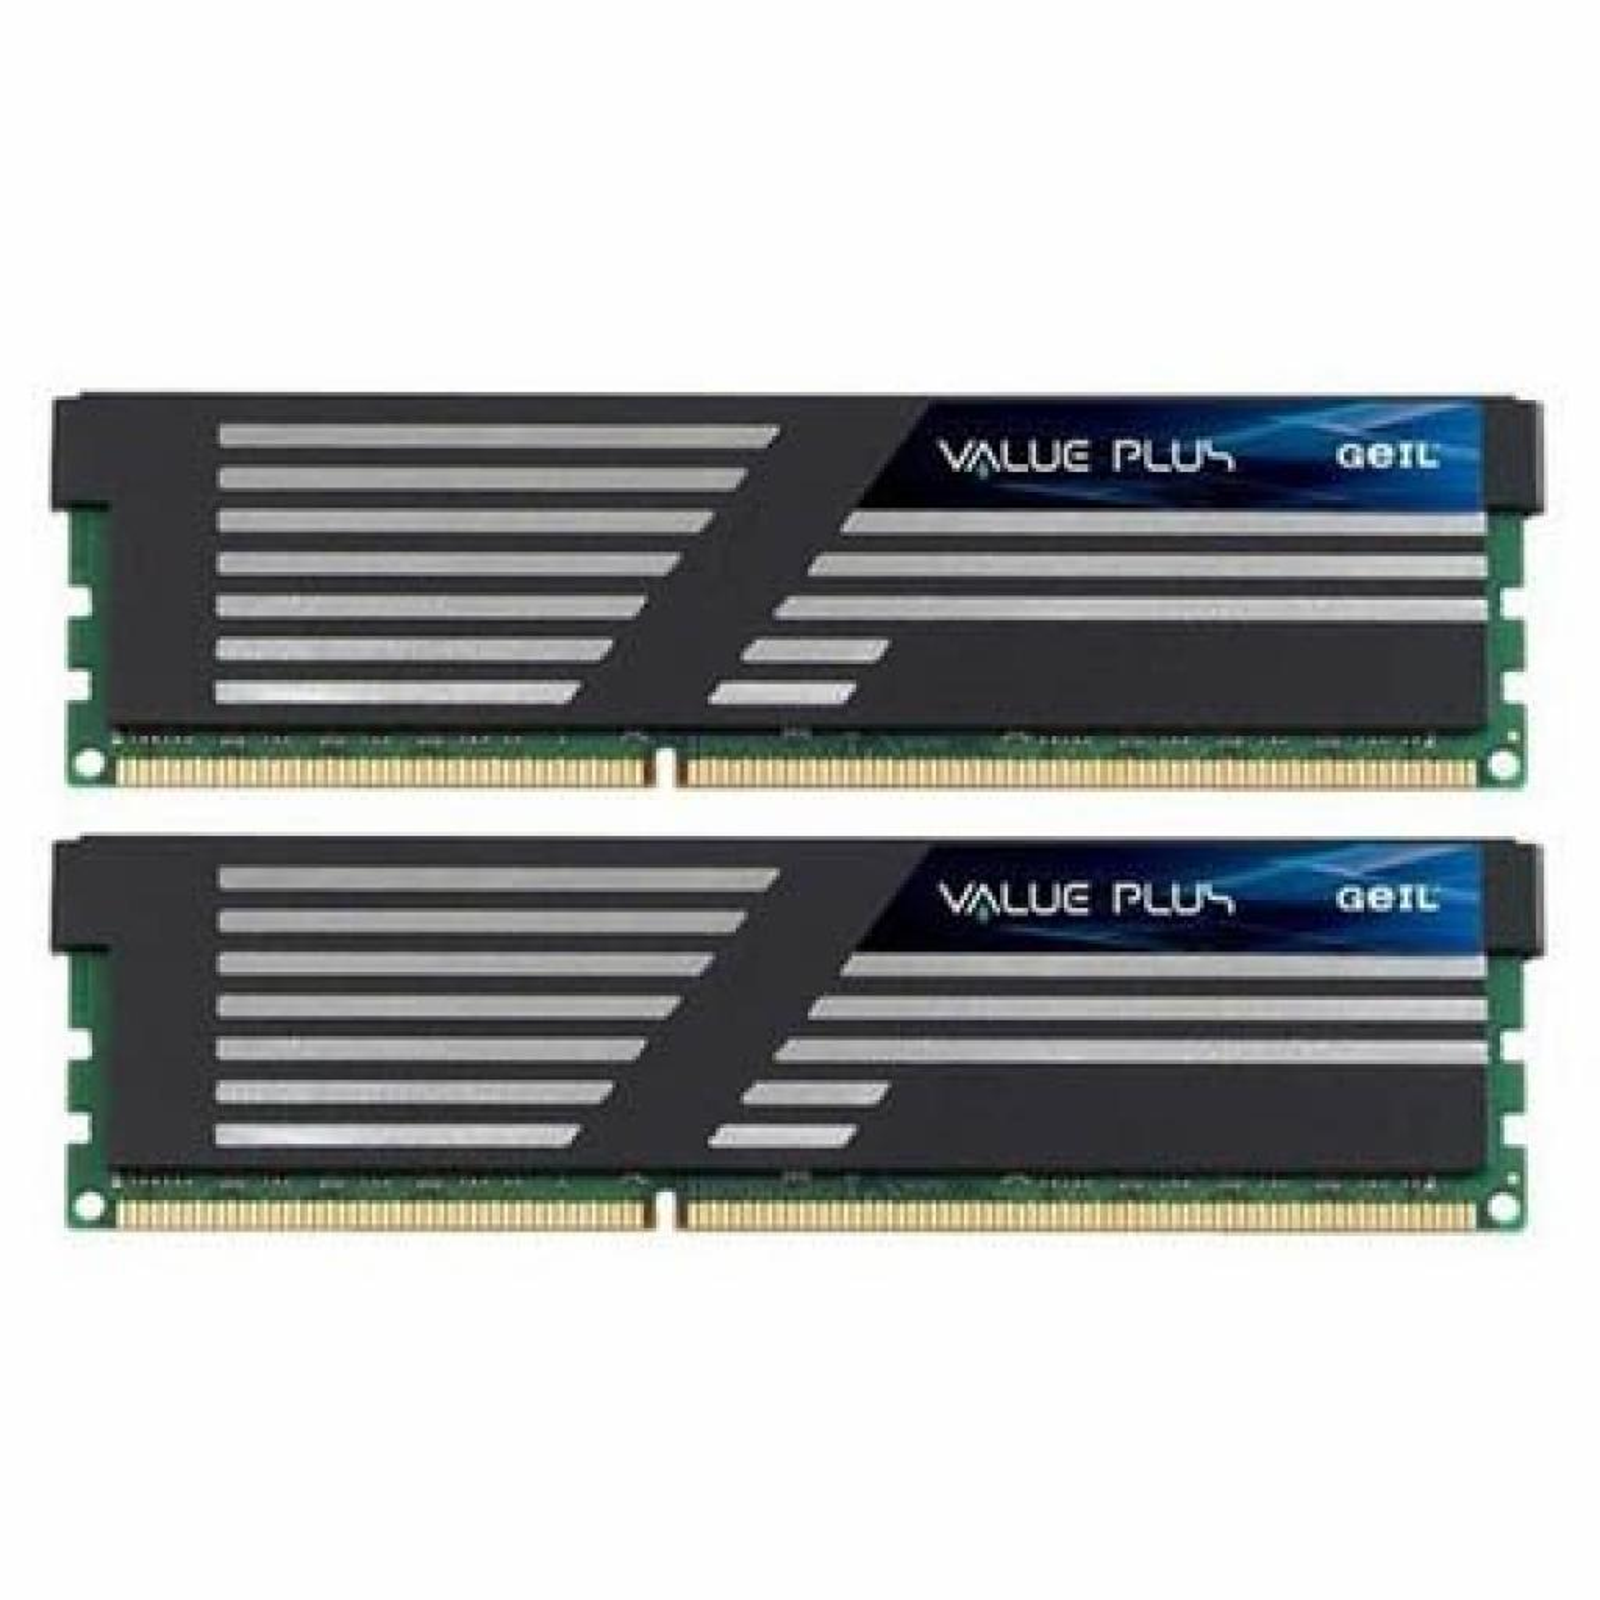 Модуль памяти для компьютера DDR3 4GB (2x2GB) 1333 MHz GEIL (GVP34GB1333C9DCN)